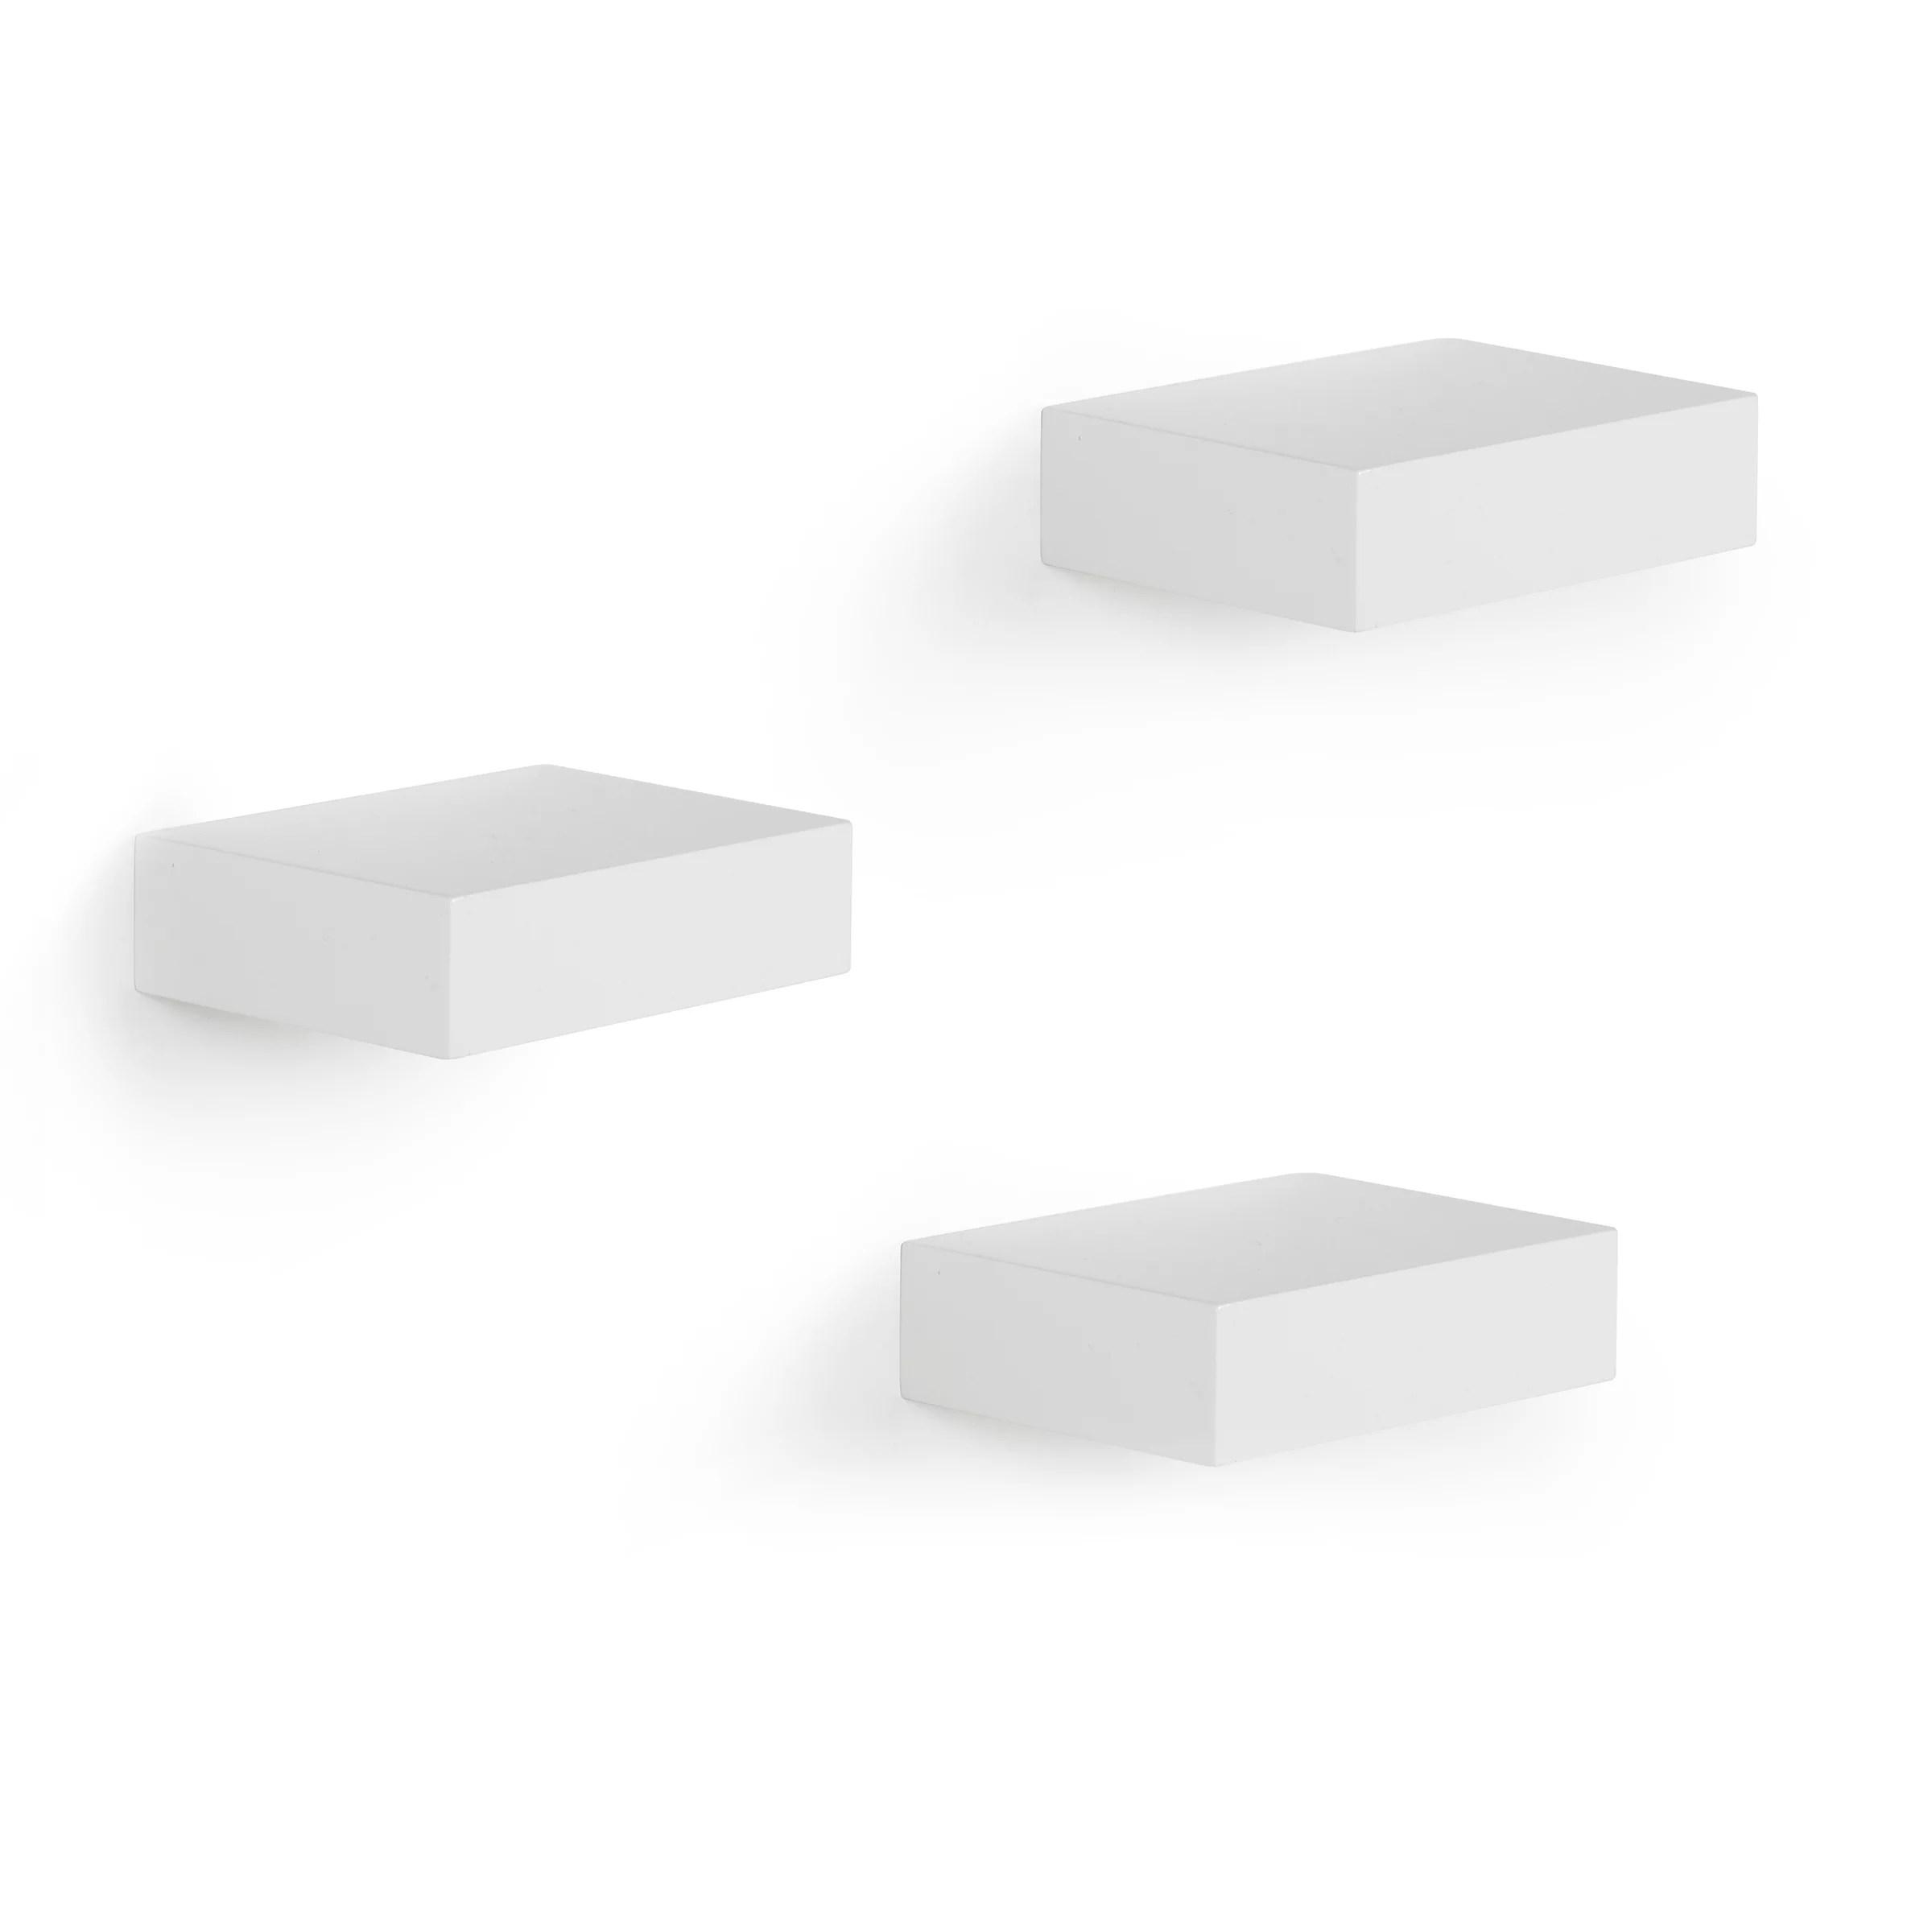 Upc 028295409803 Umbra Showcase Floating Shelves Set Small Shelf Great For Gallery Wall Wall D Upcitemdb Com